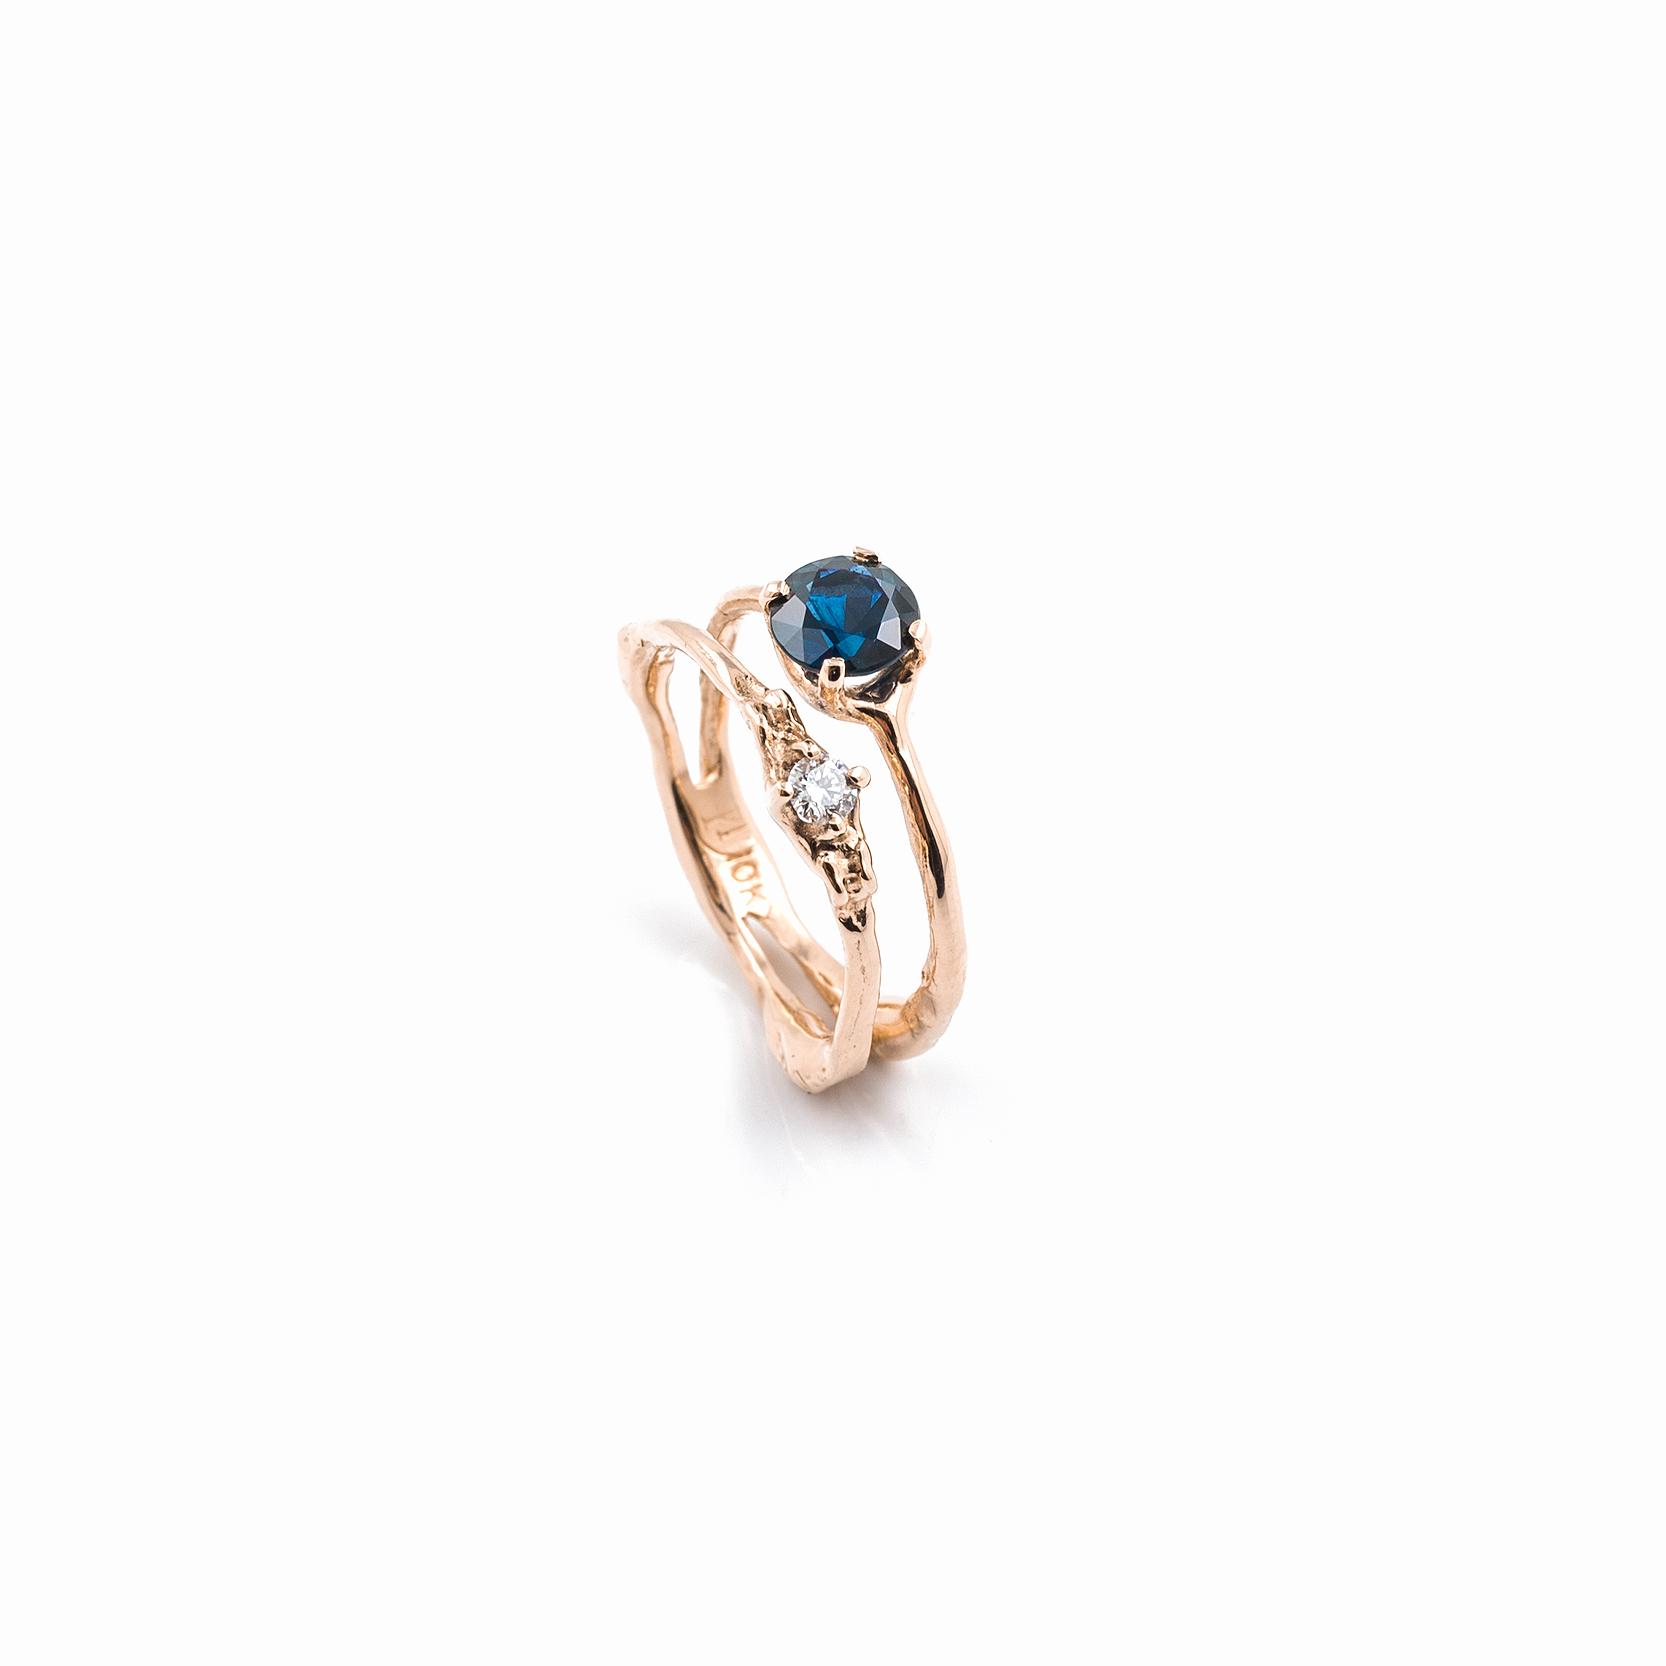 Towers Double Band | rose gold, Australian blue sapphire, white diamond.